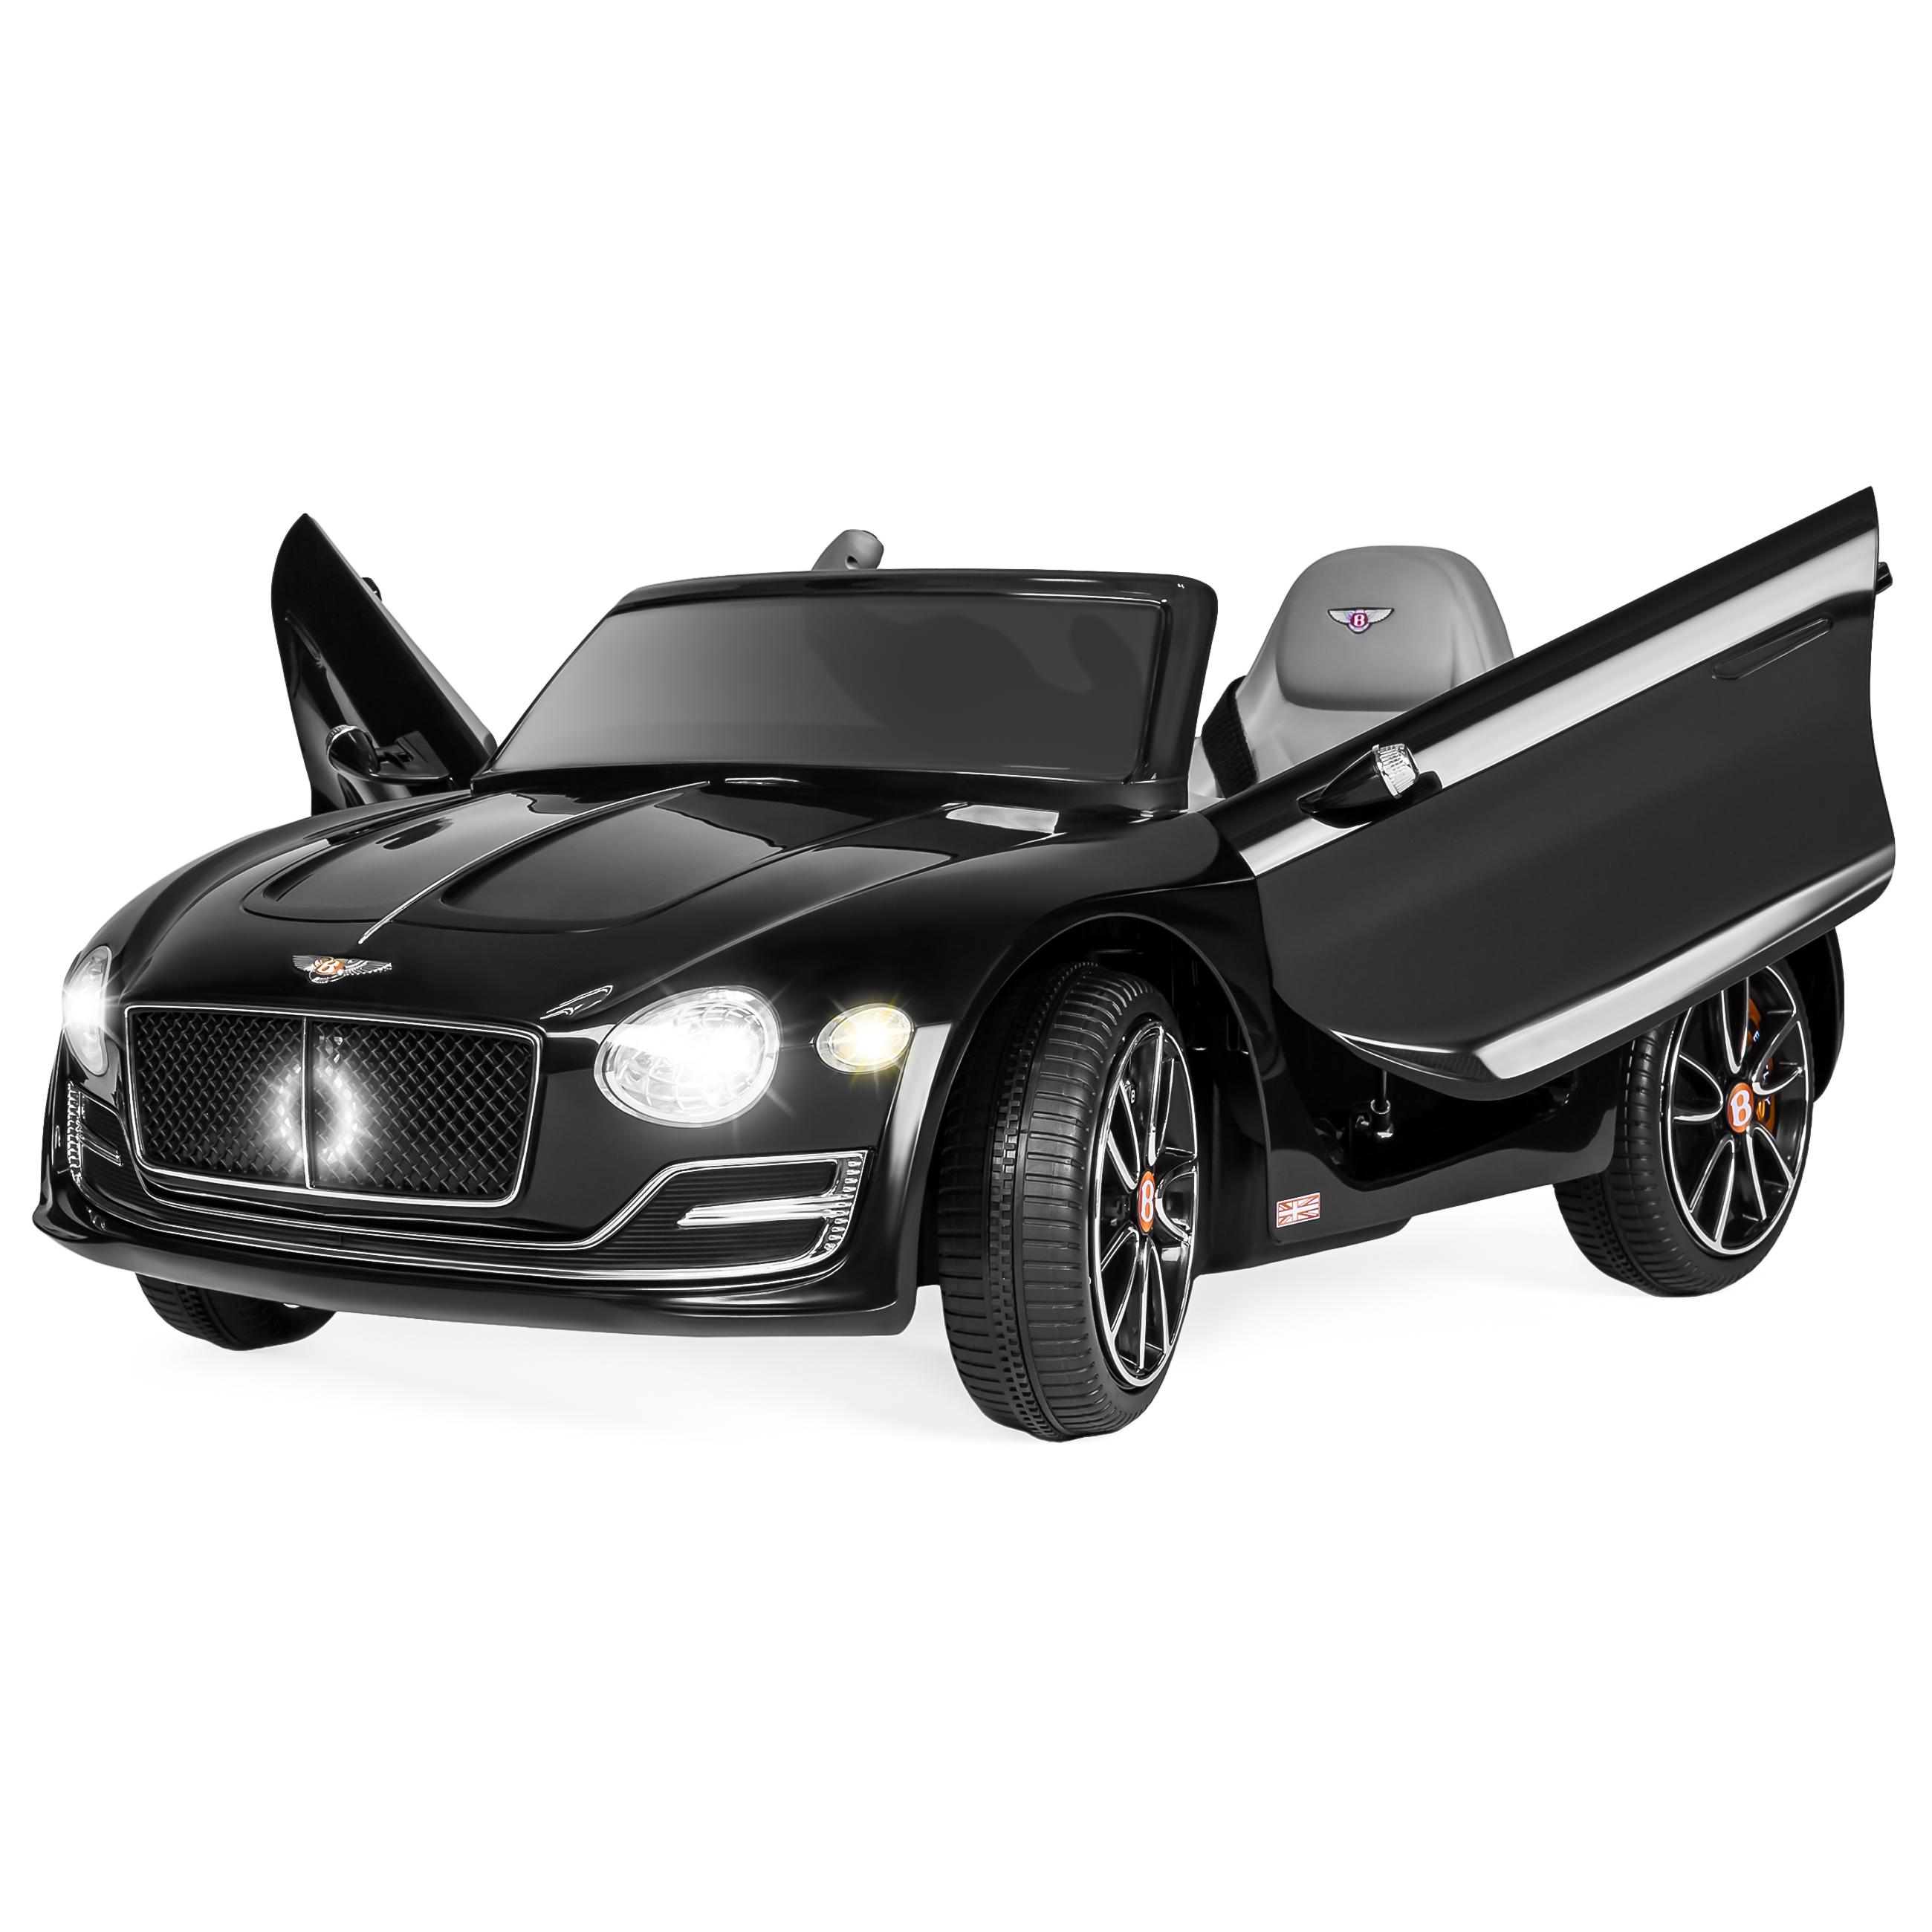 BCP-12V-Kids-Bentley-Ride-On-Car-w-Remote-Control-2-Speeds-AUX